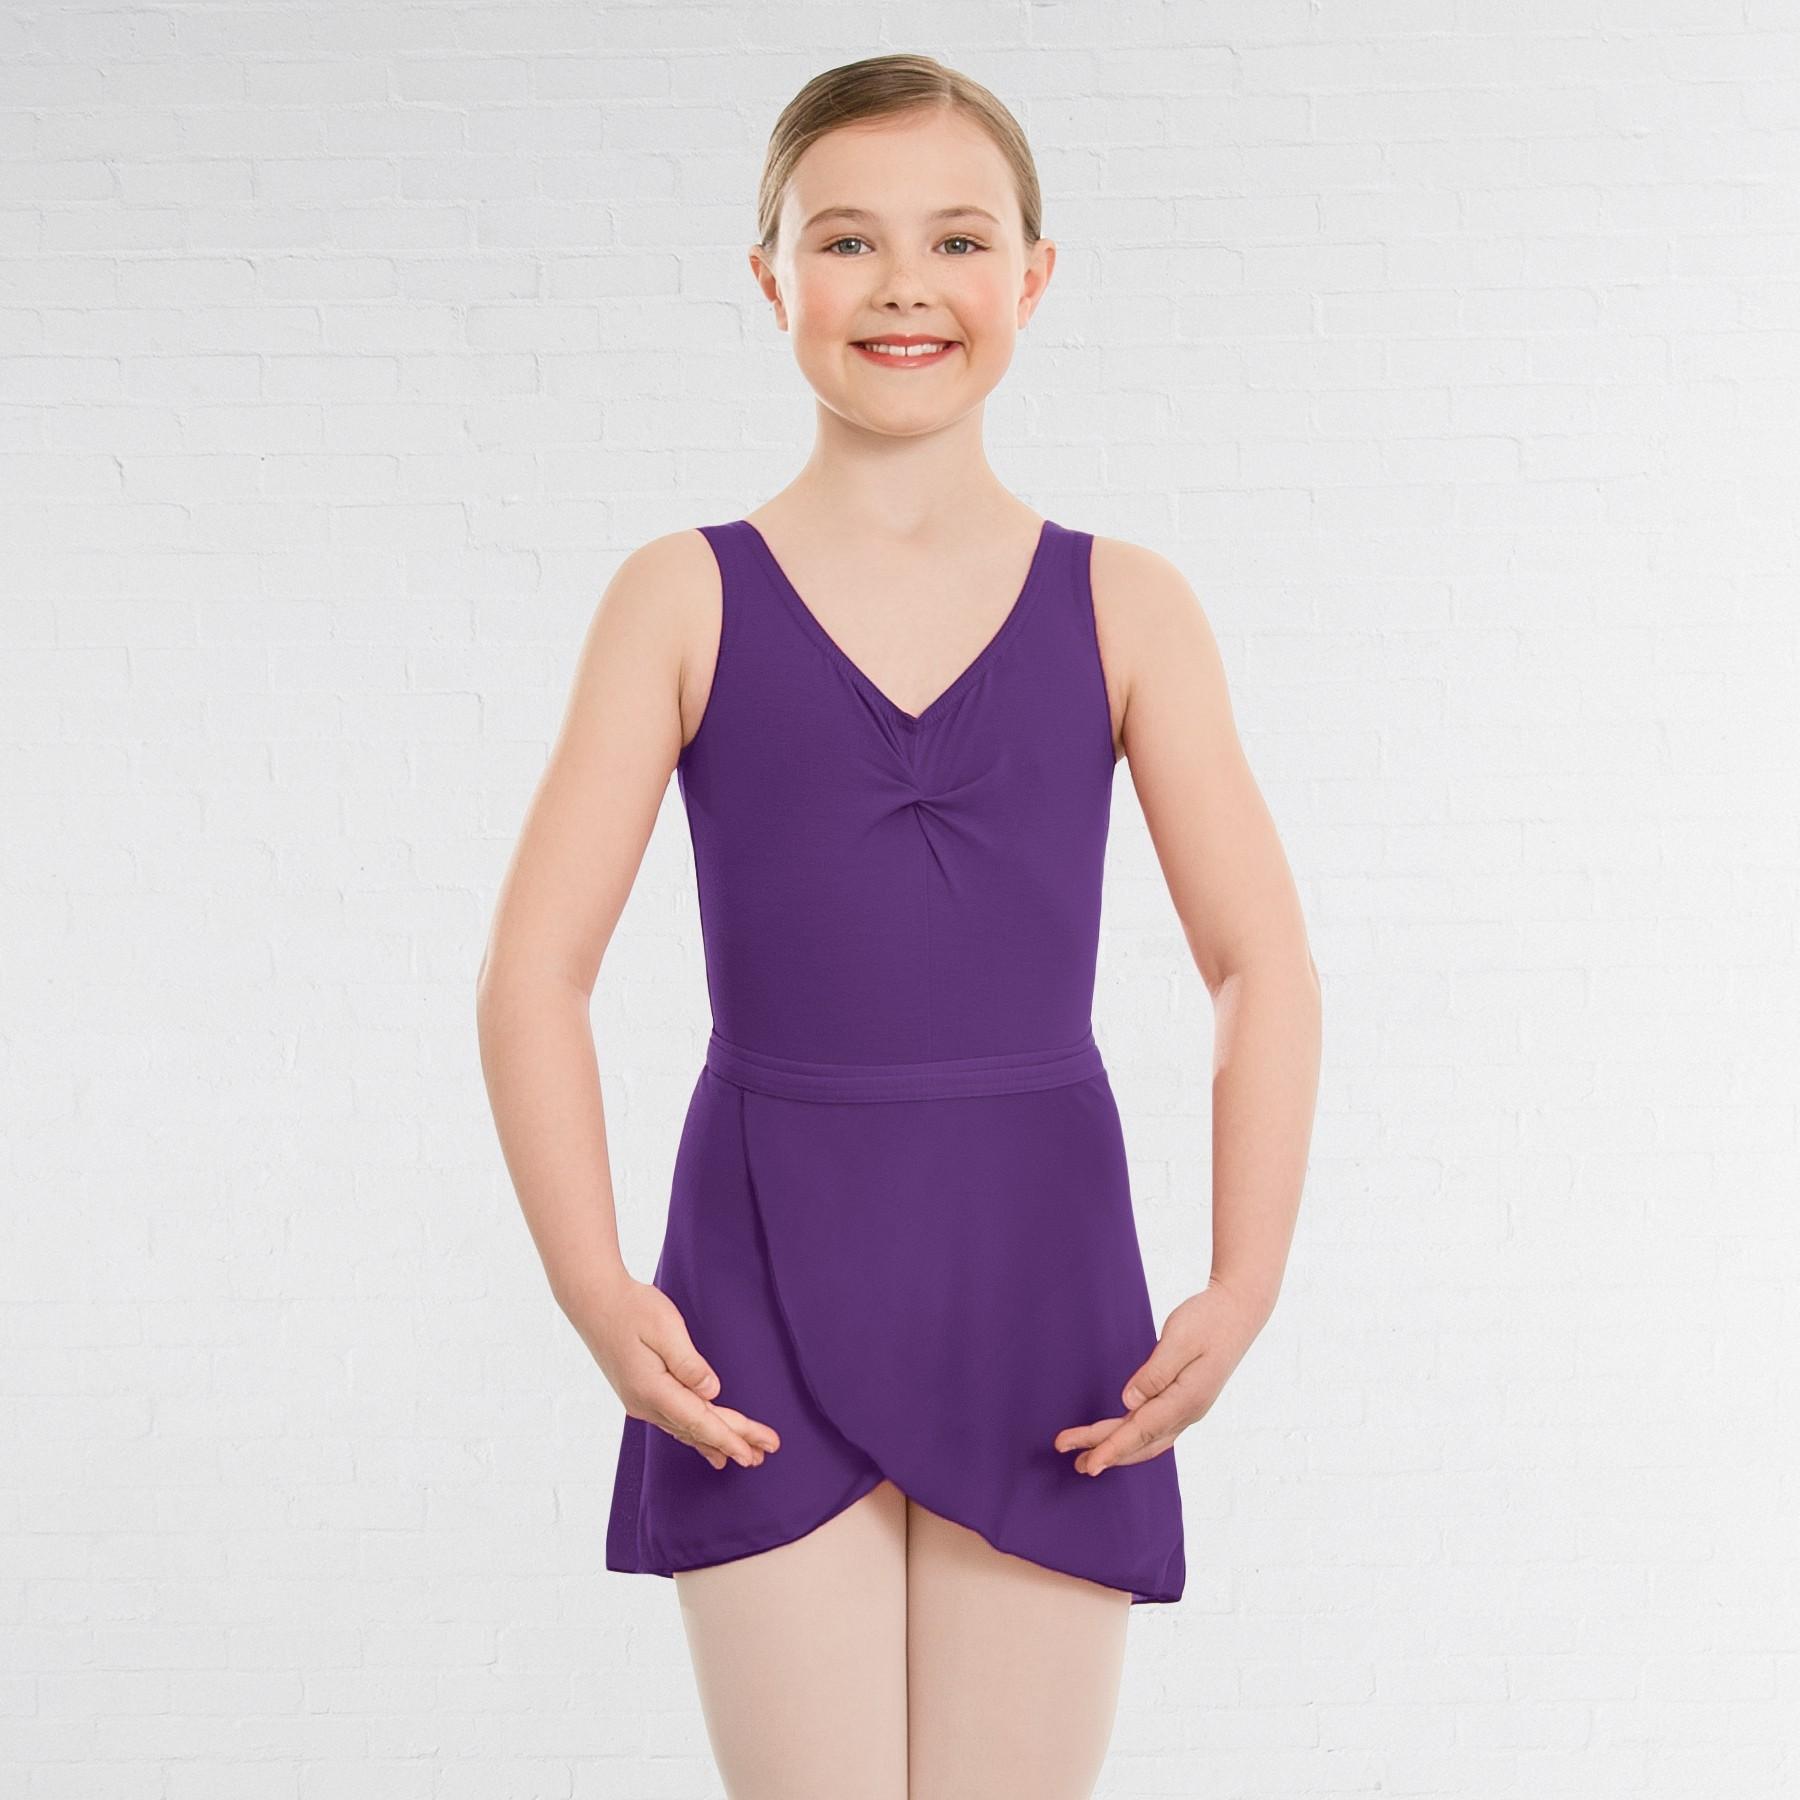 1st Position Wrapover Skirt (ISTD style) (Purple)